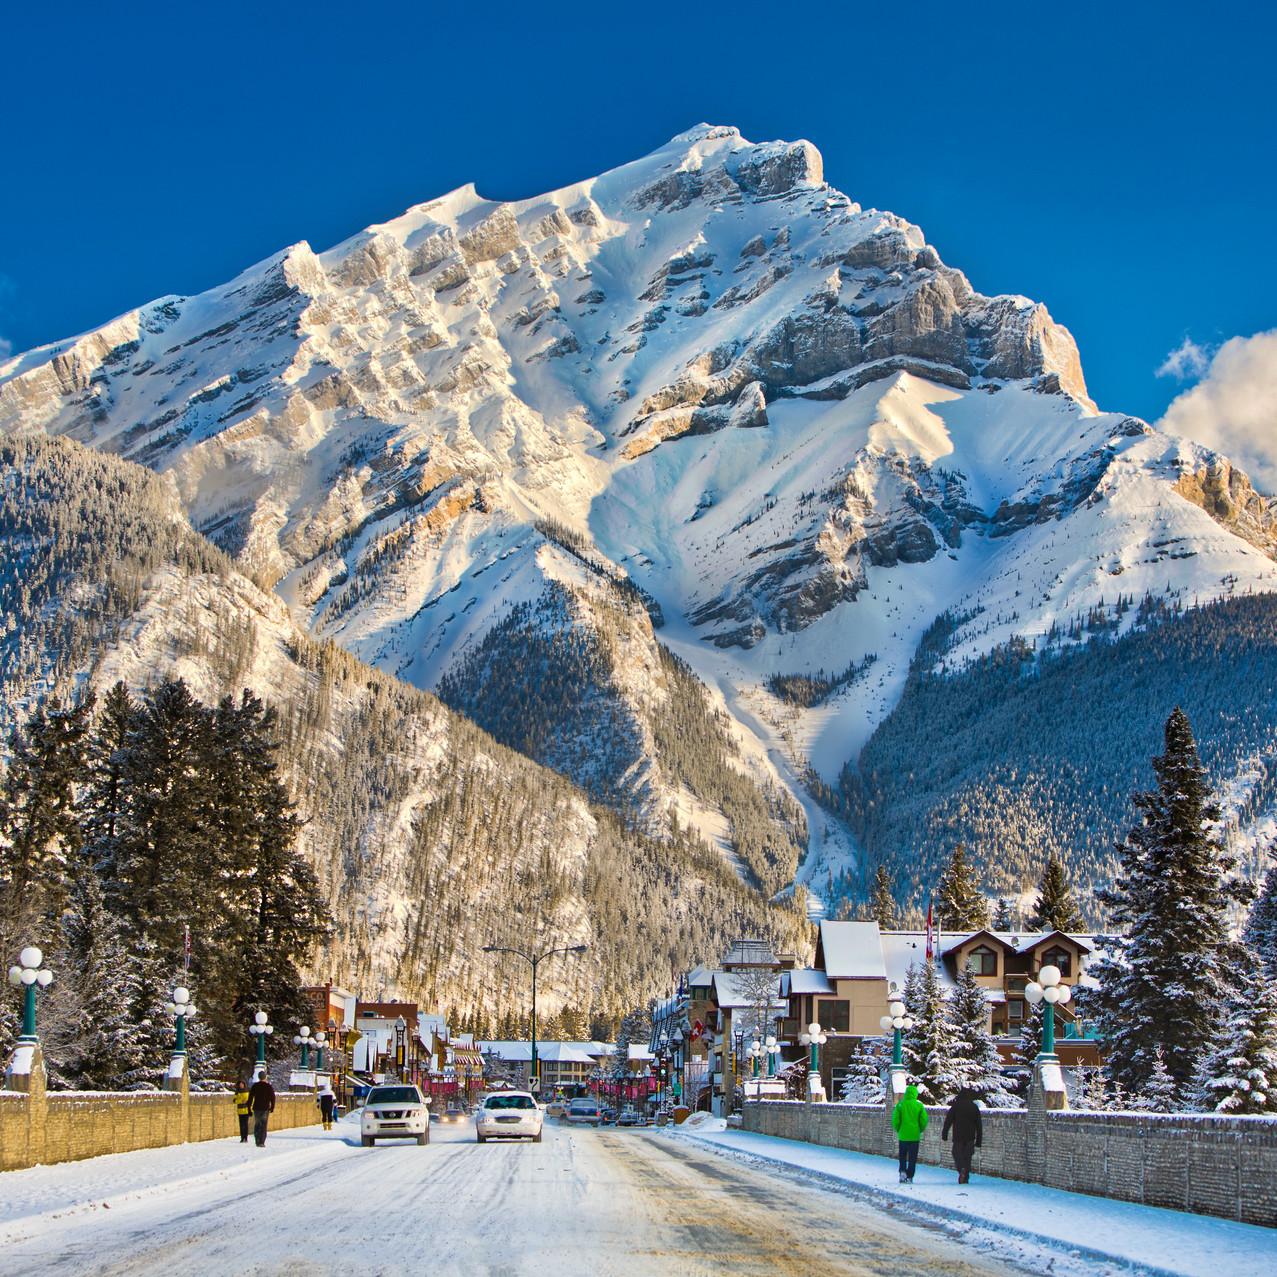 Destination_Signature_Banff_Avenue_Winte